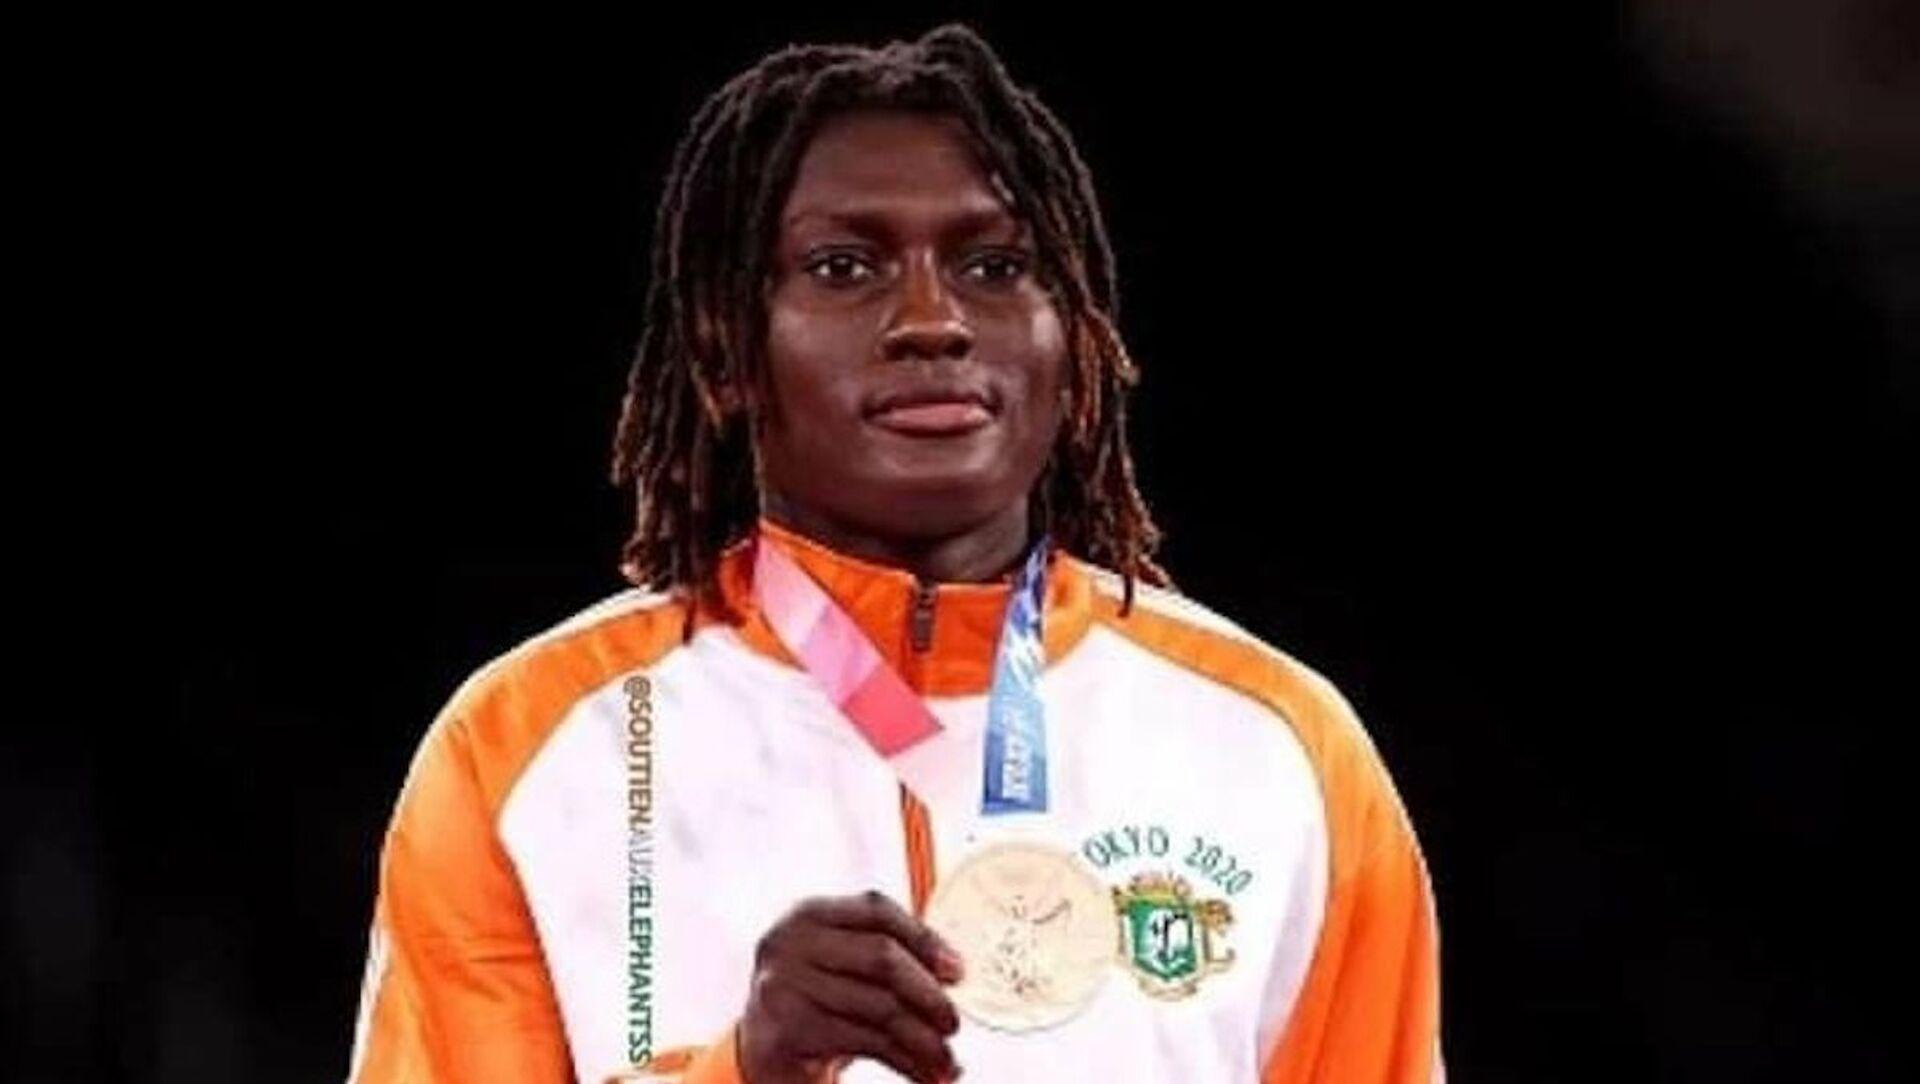 L'Ivoirienne médaillée de bronze de taekwando des JO 2021, Ruth Gbagbi - Sputnik France, 1920, 27.07.2021